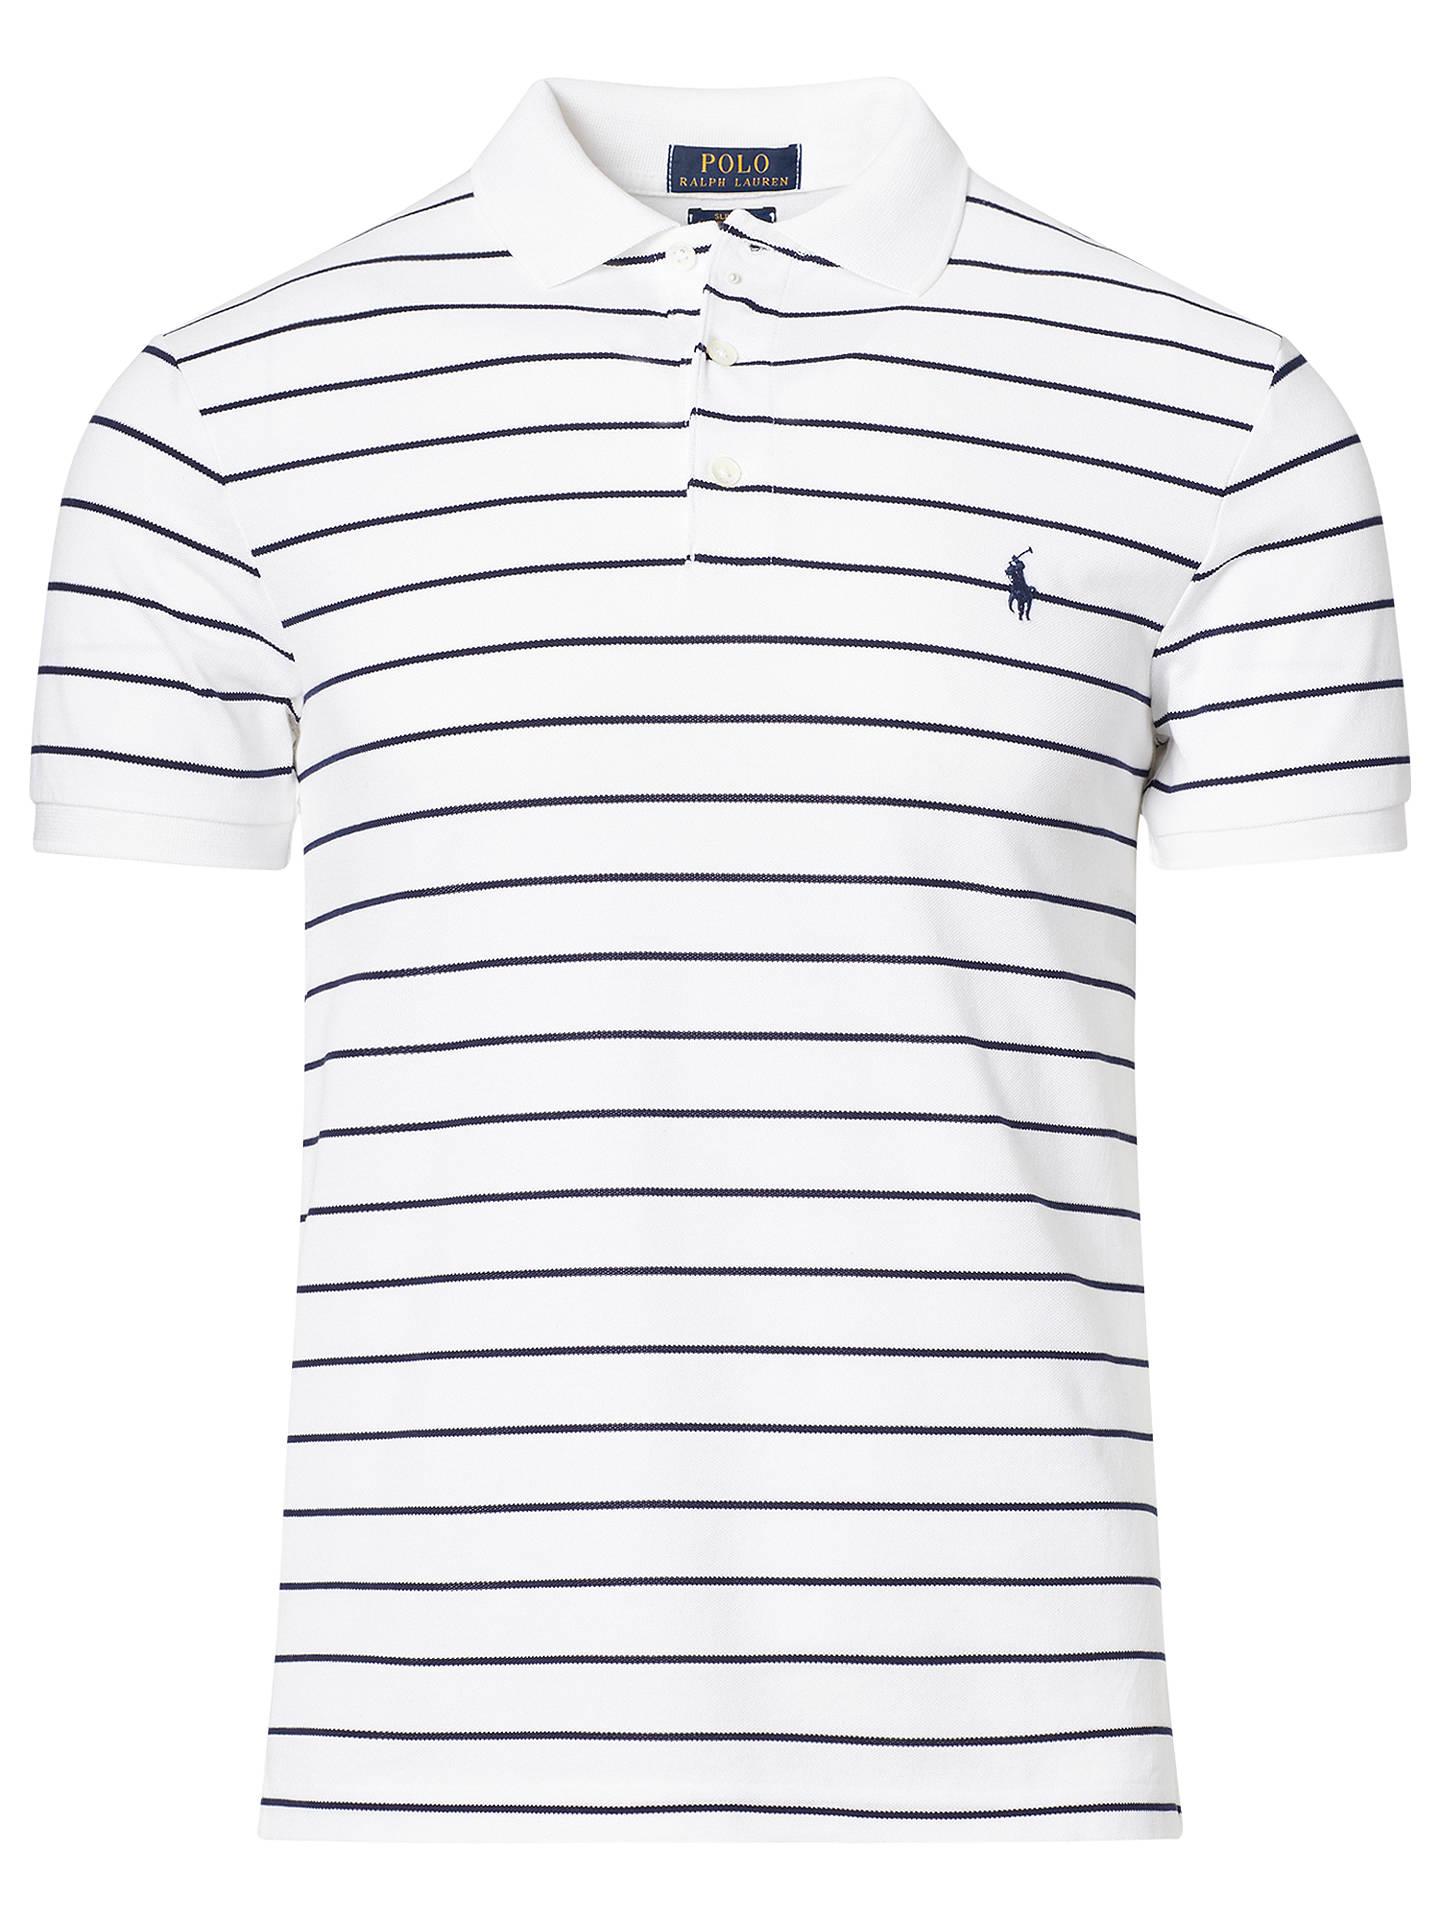 457207d025ea2 ... Buy Polo Ralph Lauren Striped Slim Fit Stretch Cotton Mesh Polo Shirt